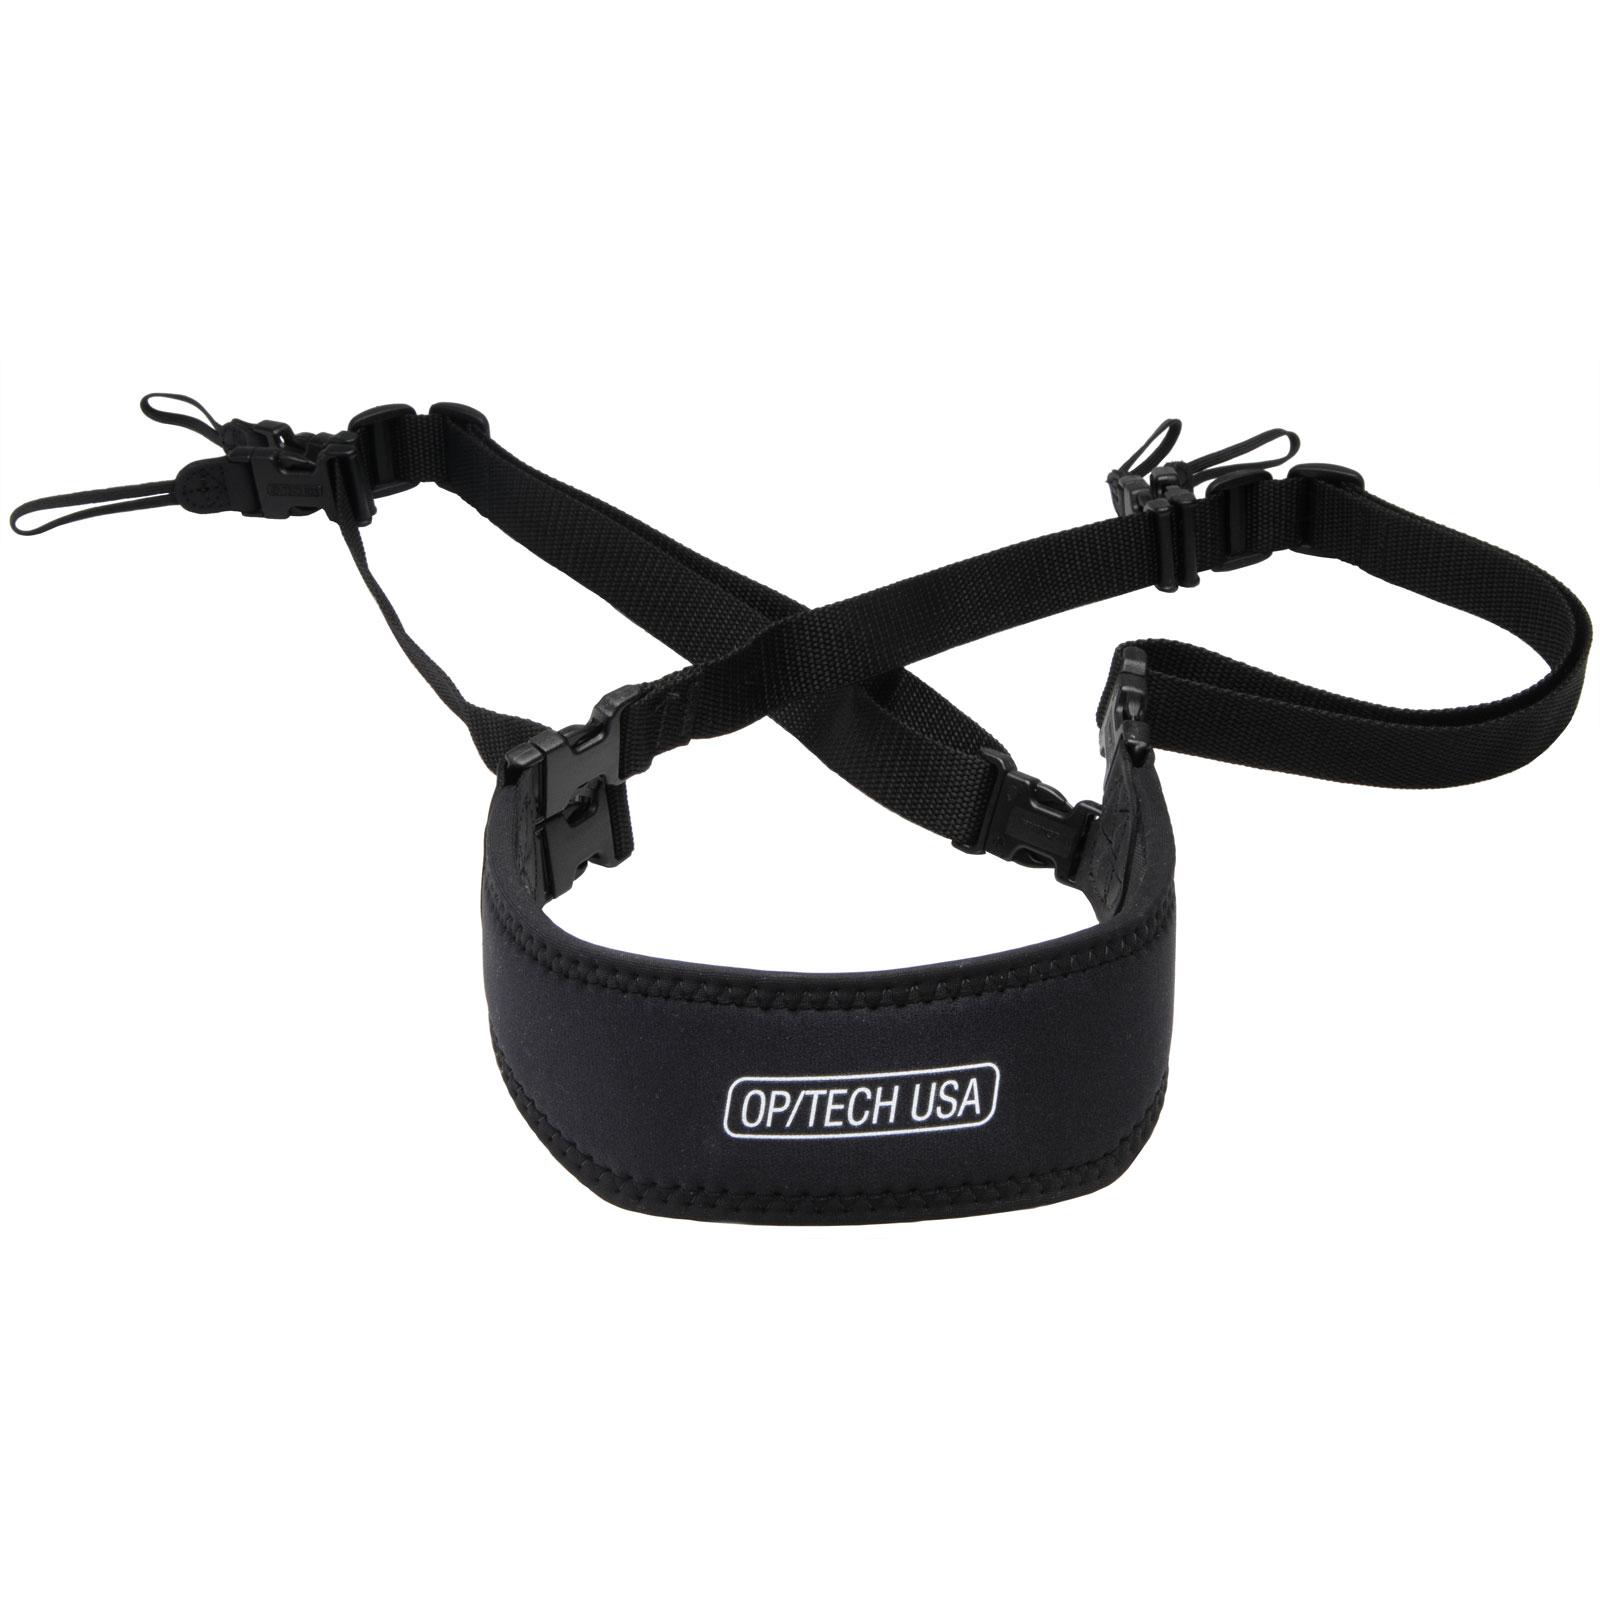 OP/Tech USA Neoprene Utility Camera Strap-Sling Duo (Black)